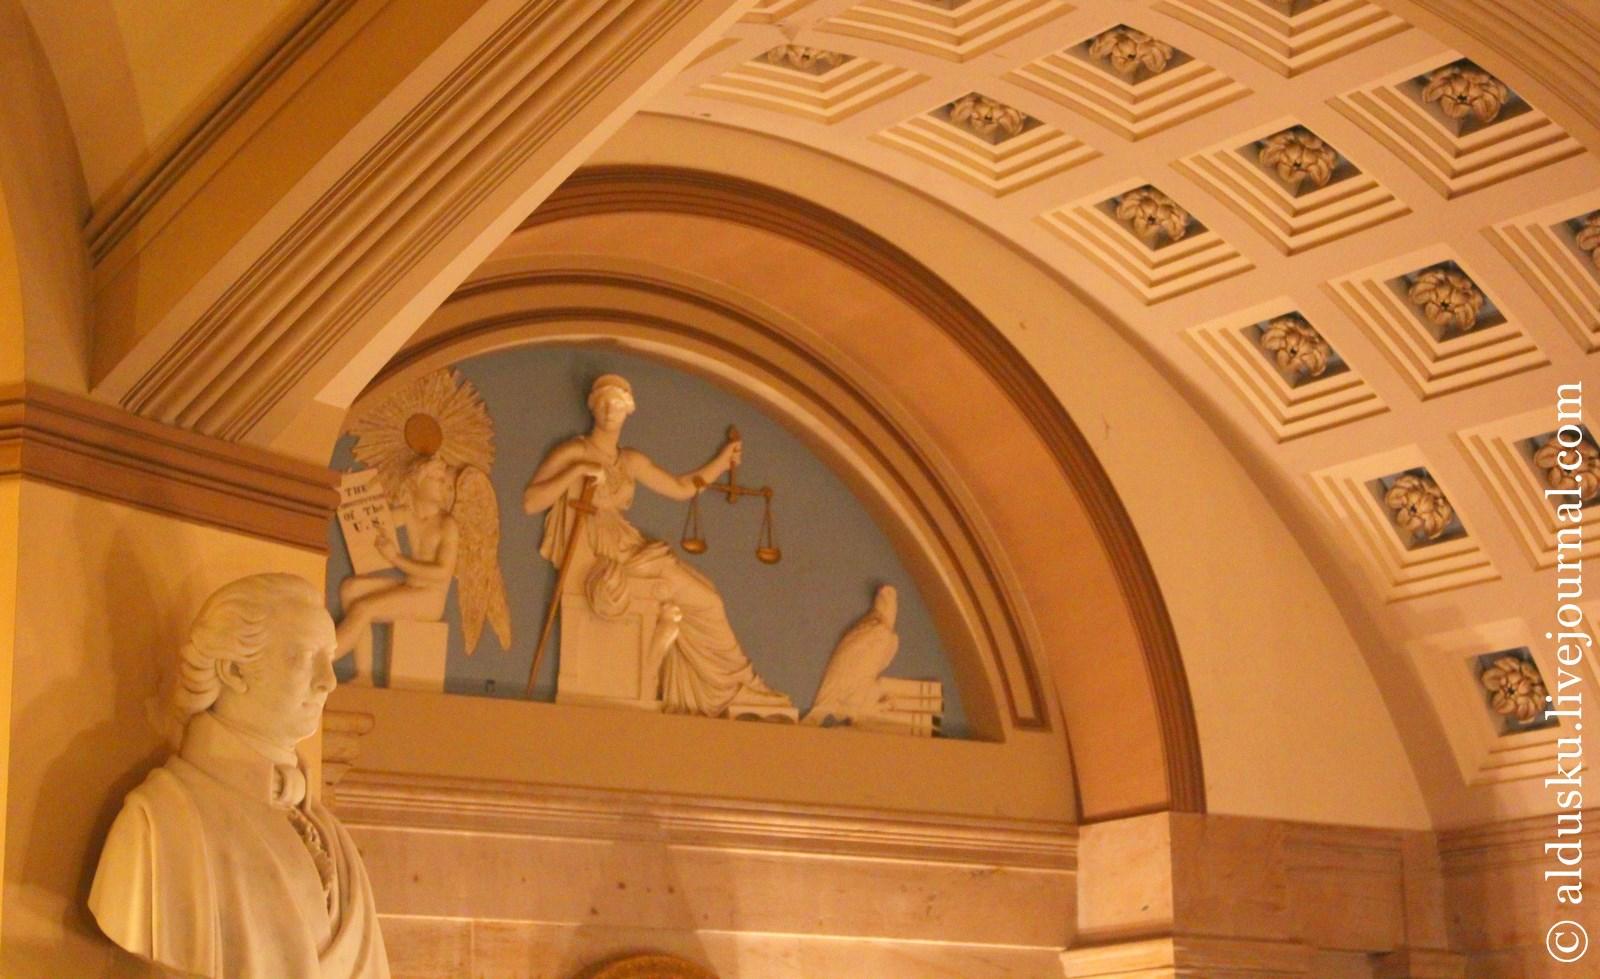 Фемида без повязки. Работа Карло Францони Carlo Franzoni(1817). Позади старой палаты Верховного Суда